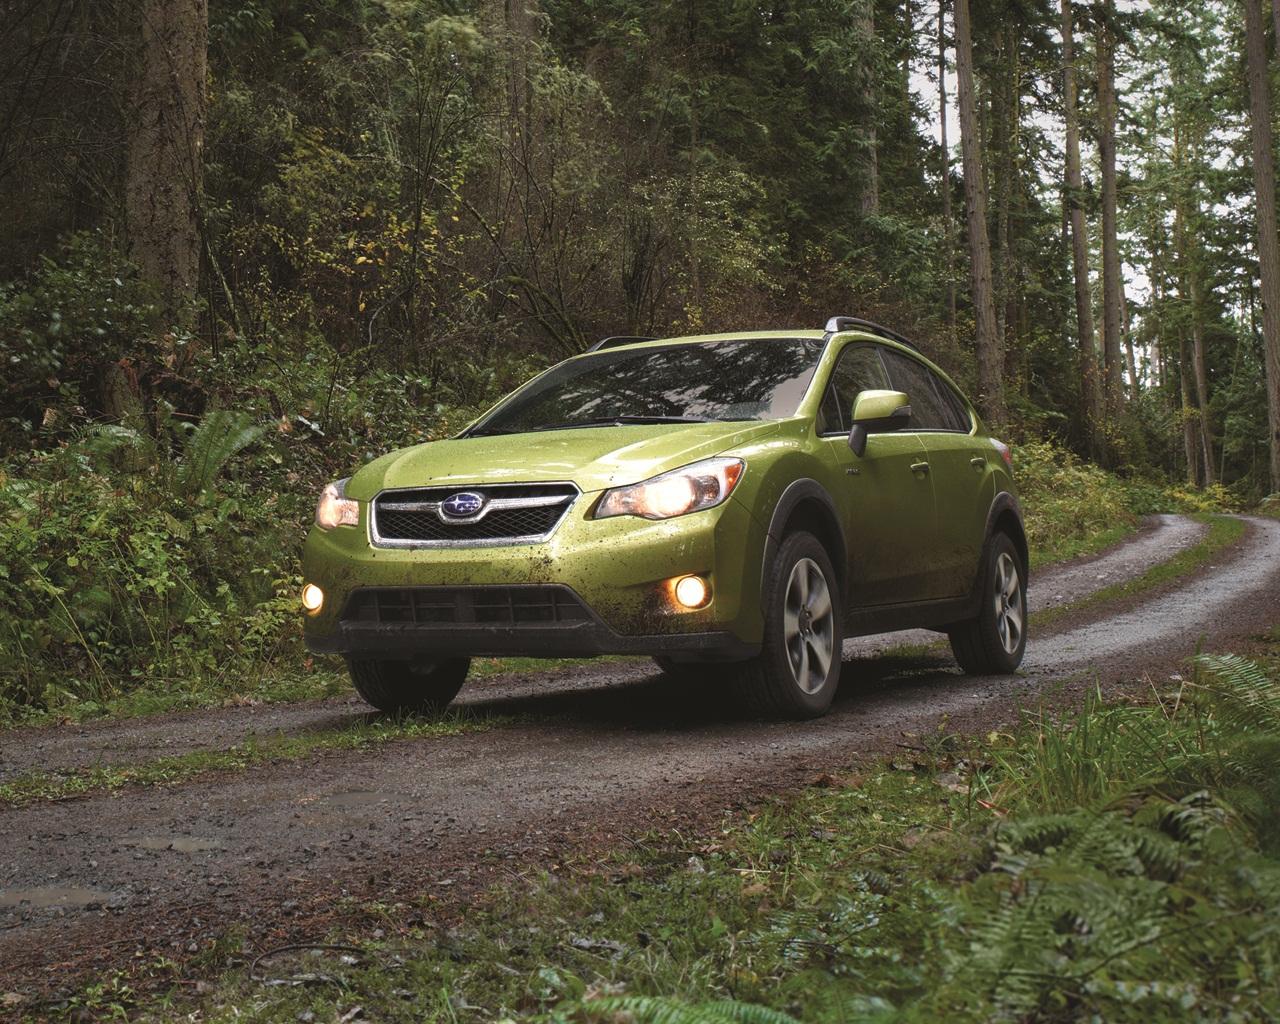 2014 Subaru XV Crosstrek Hybrid Priced From 26820